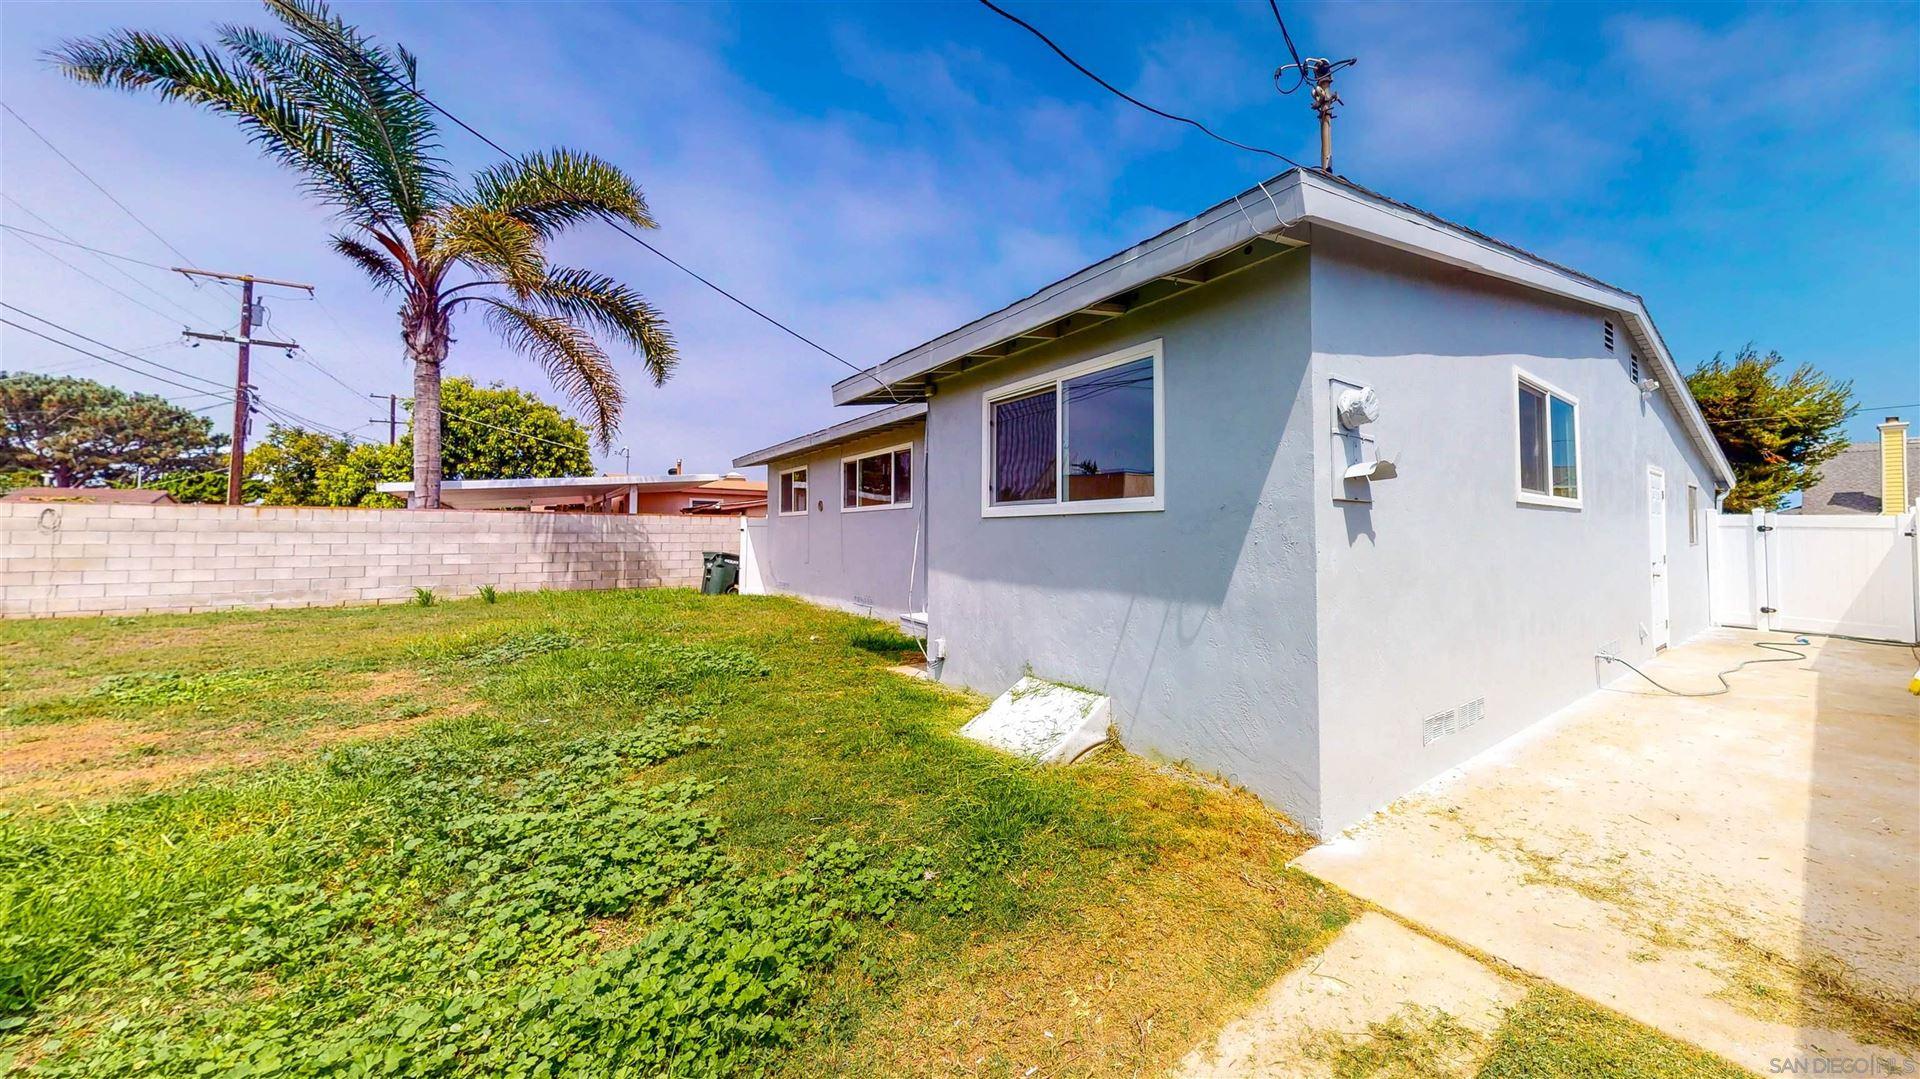 Photo of 373 Calla Ave, Imperial Beach, CA 91932 (MLS # 210026577)